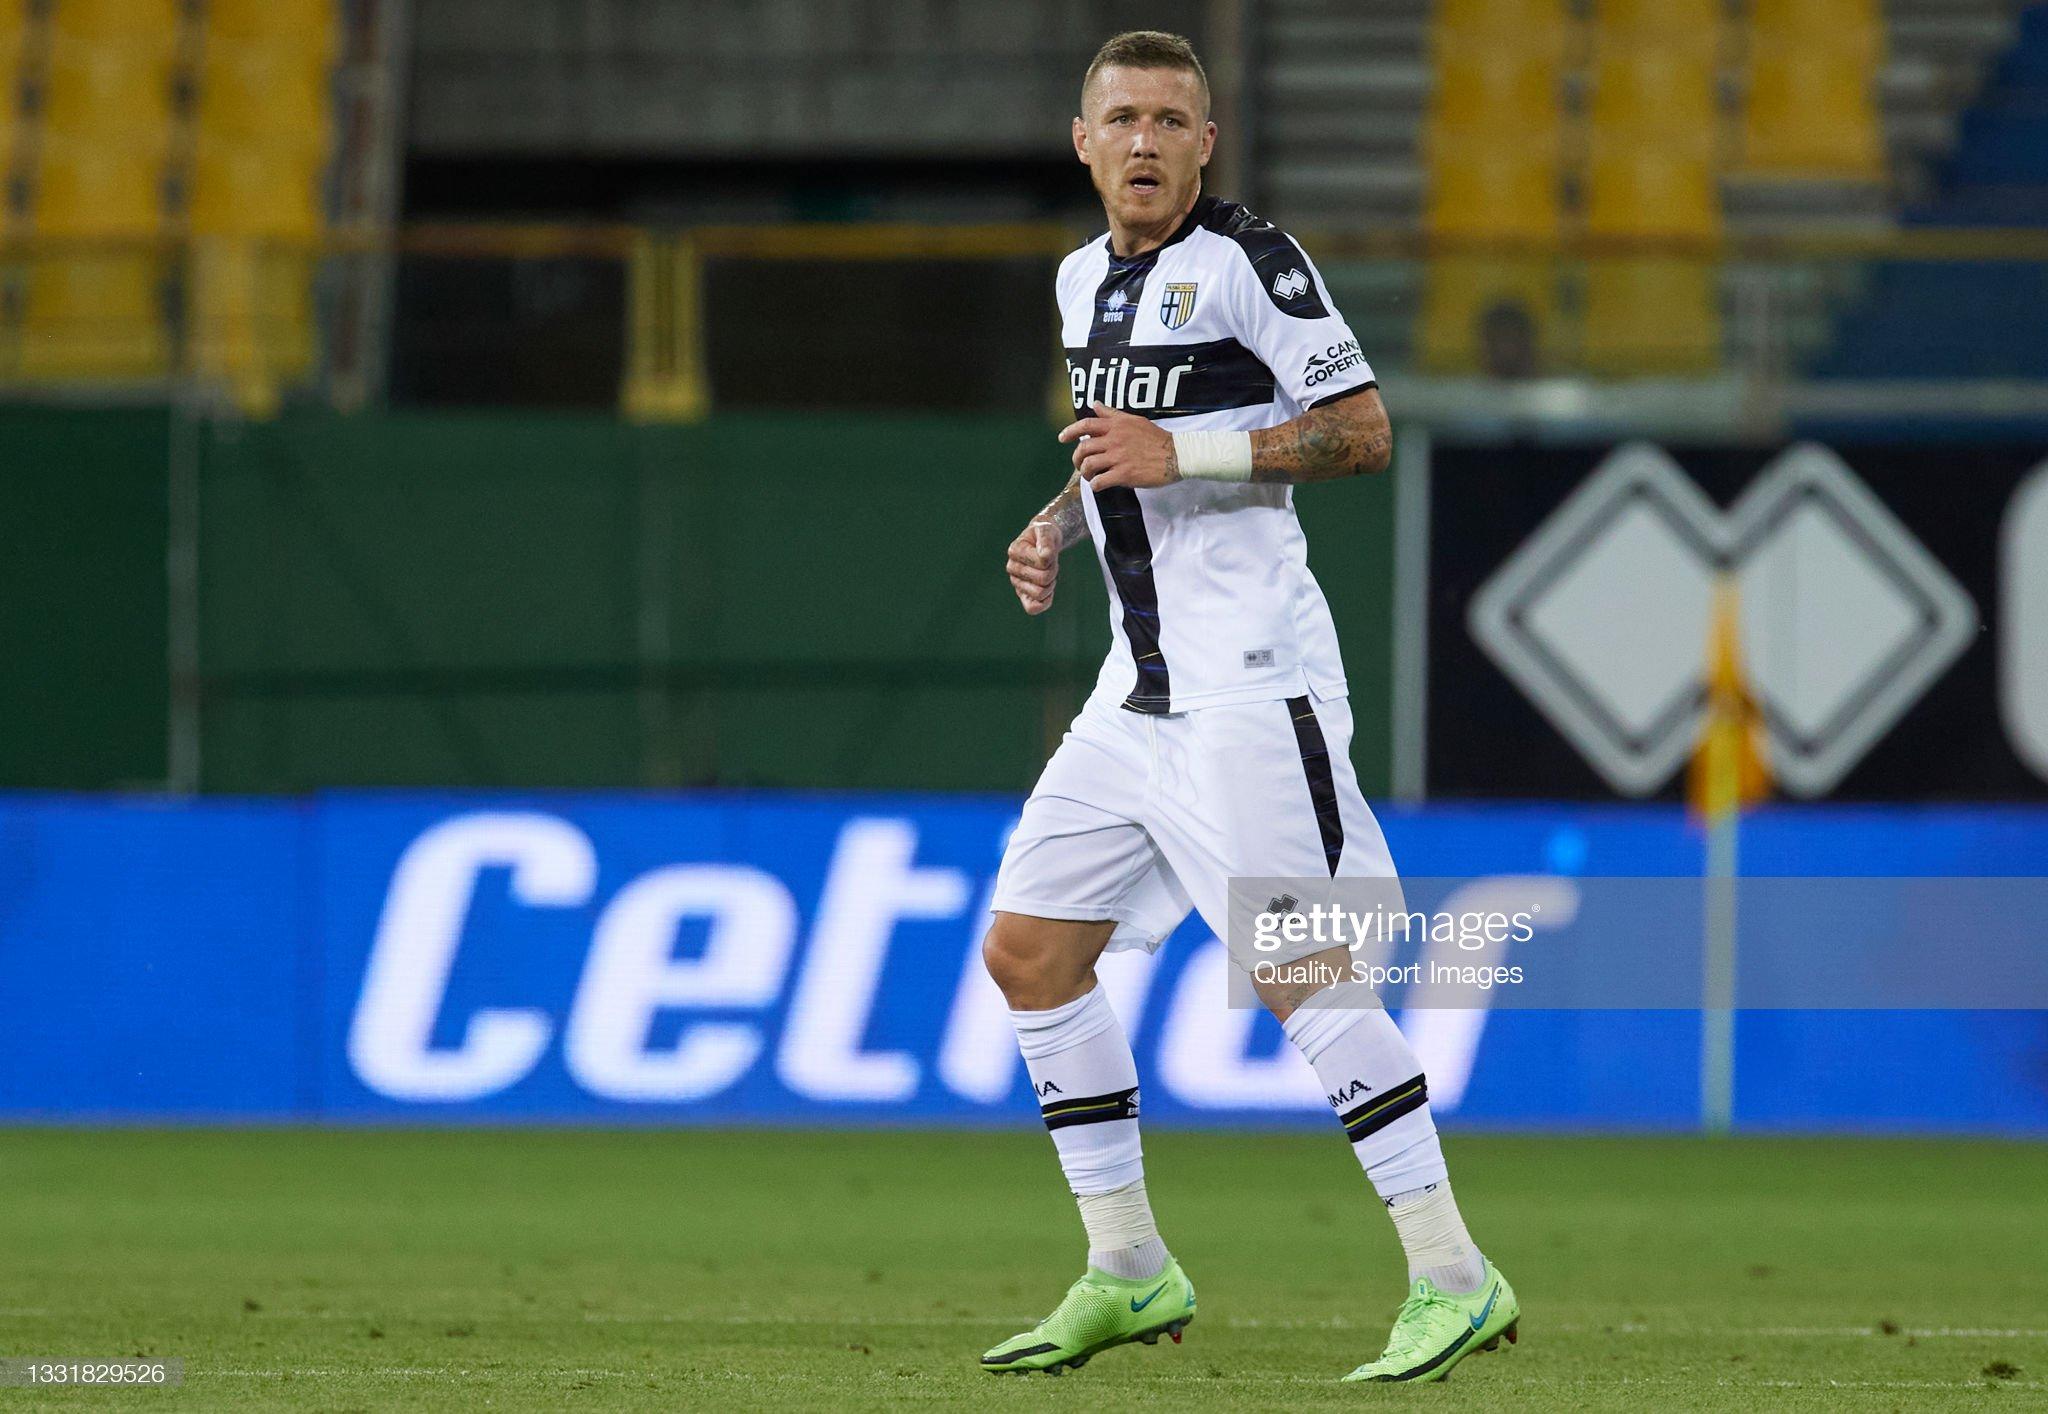 Parma Calcio v US Sassuolo - Pre-Season Friendly : ニュース写真